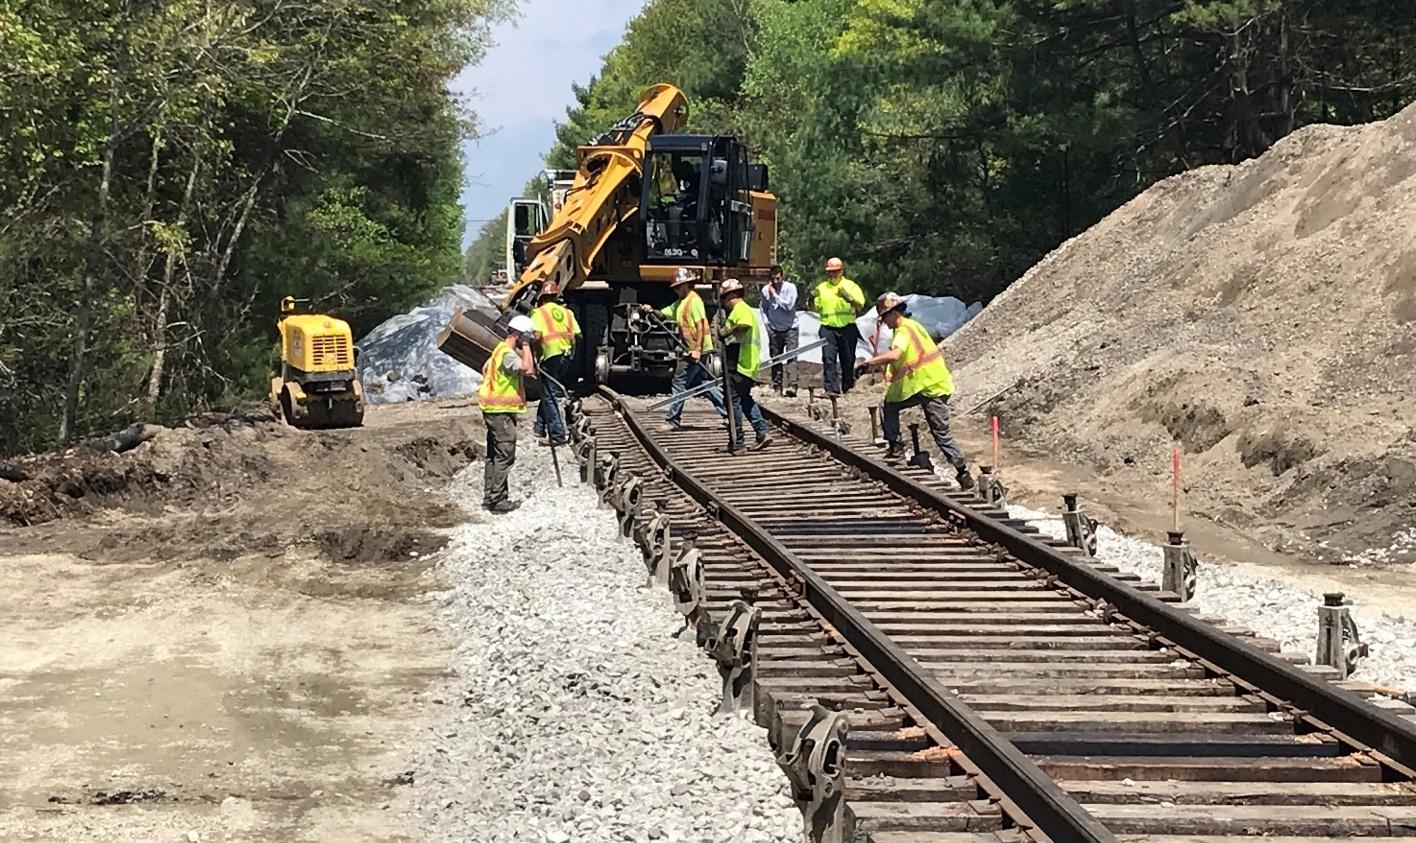 South Coast Rail Projects Mbta